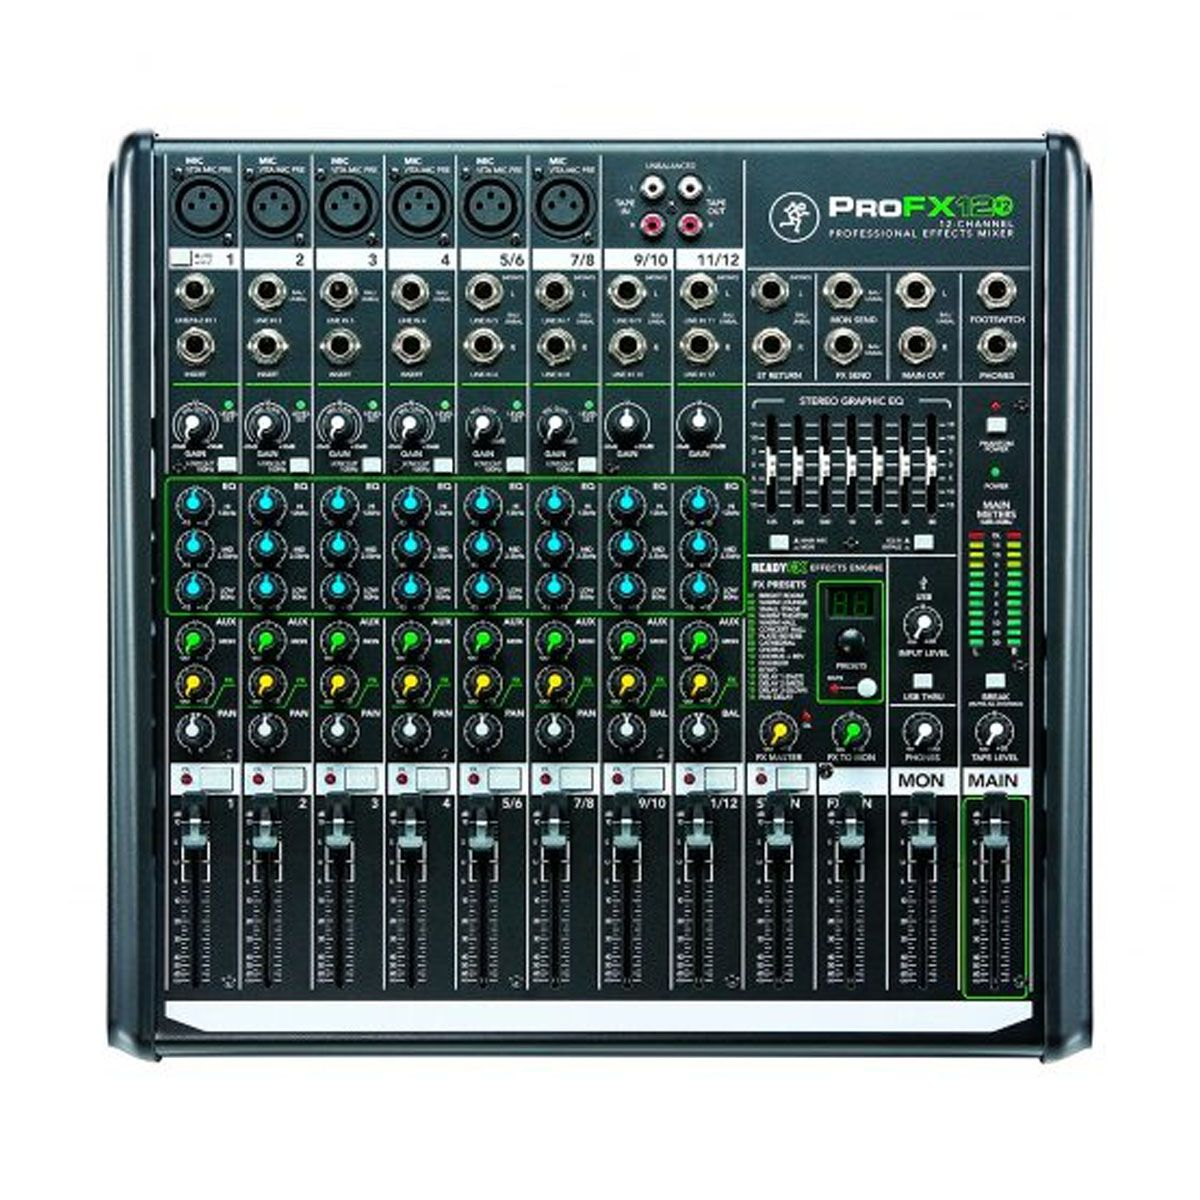 Mesa p/ 6 Mics + 4 Ch estéreo, 1 AUX, USB e FX Mackie PROFX12V2